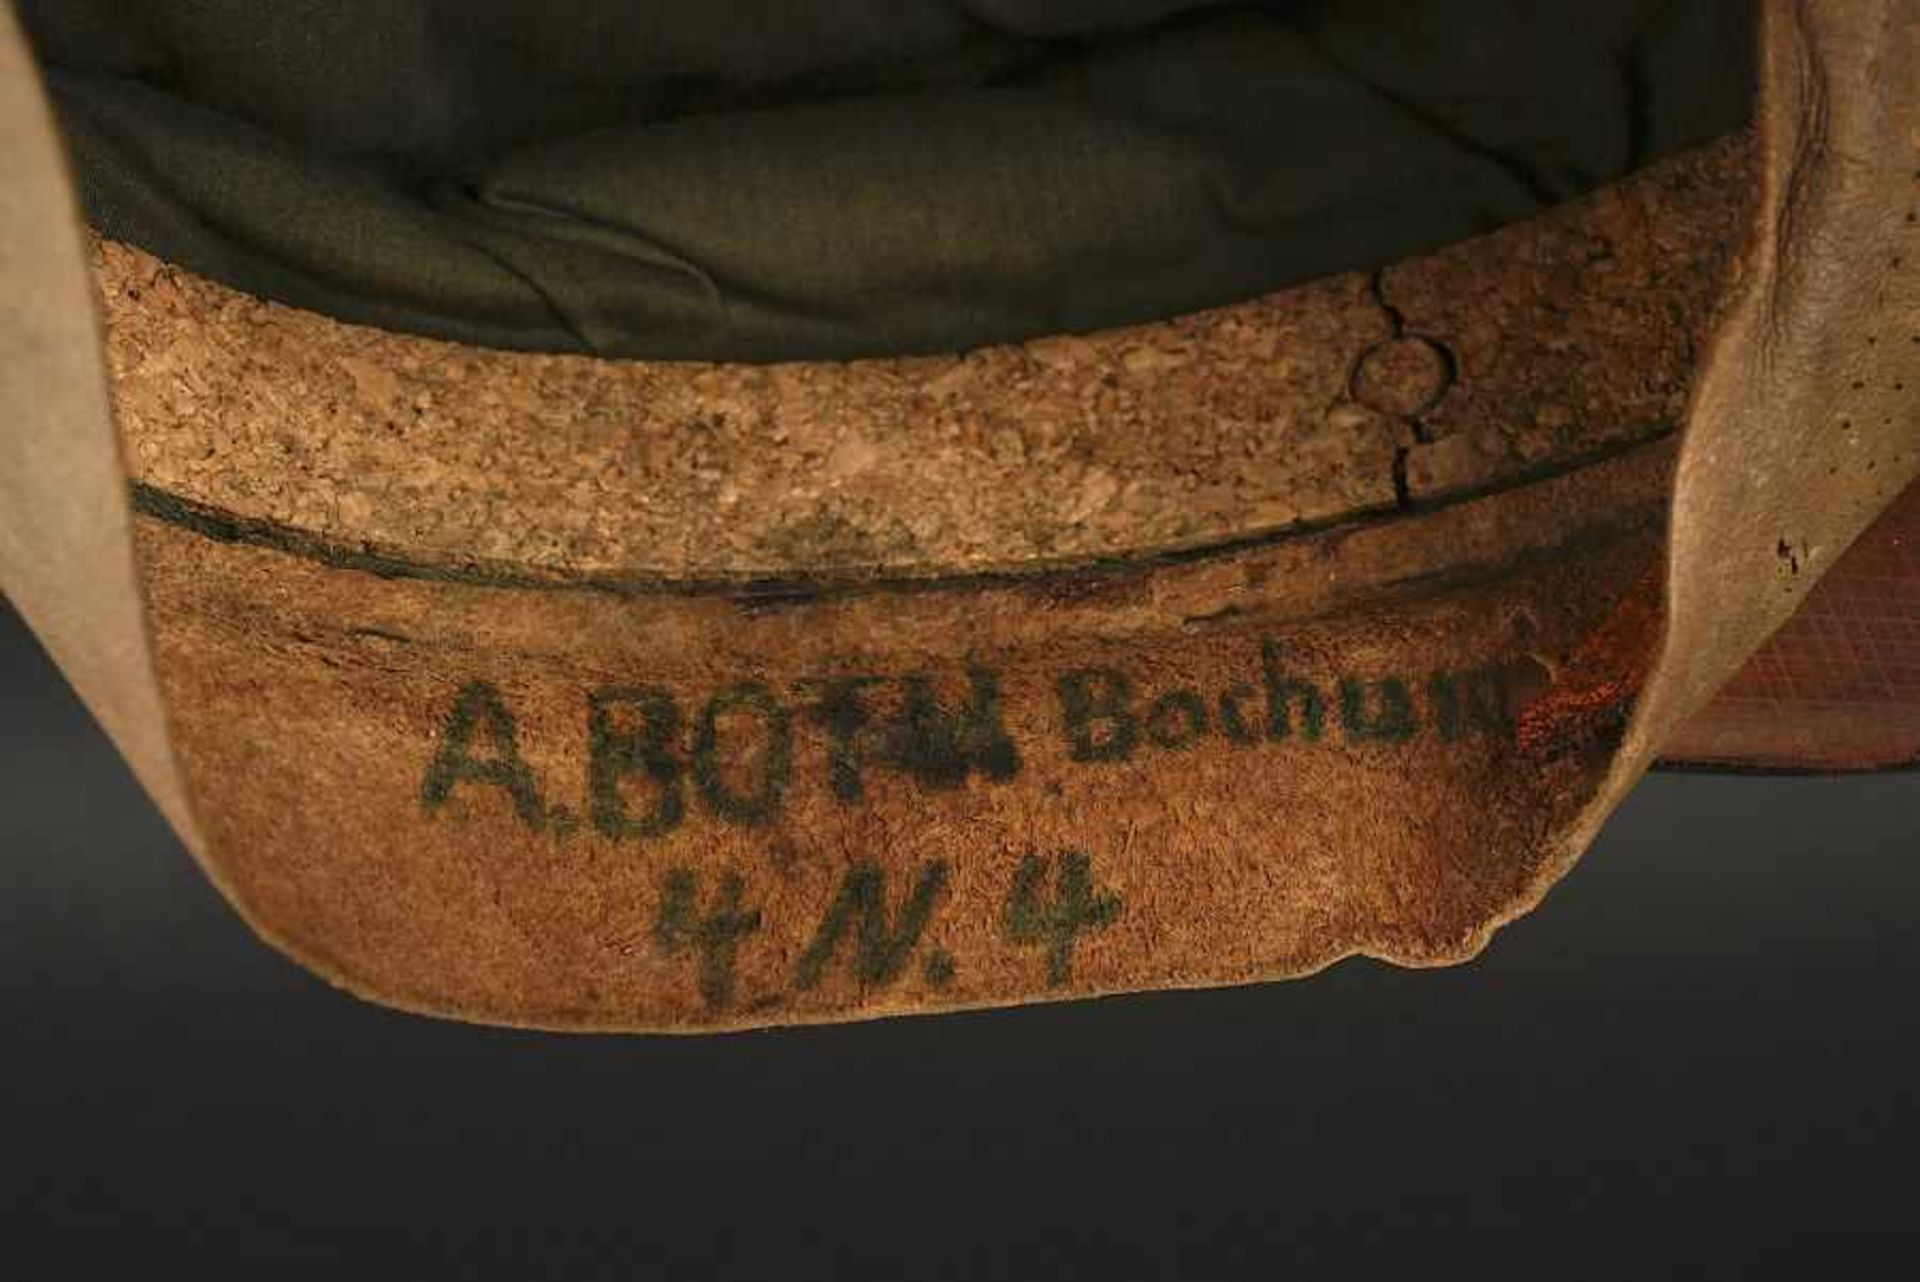 Casquette SS d'Armin Both. SS Cap belonging to Armin Both En gabardine Feldgrau, bandeau en - Bild 3 aus 4